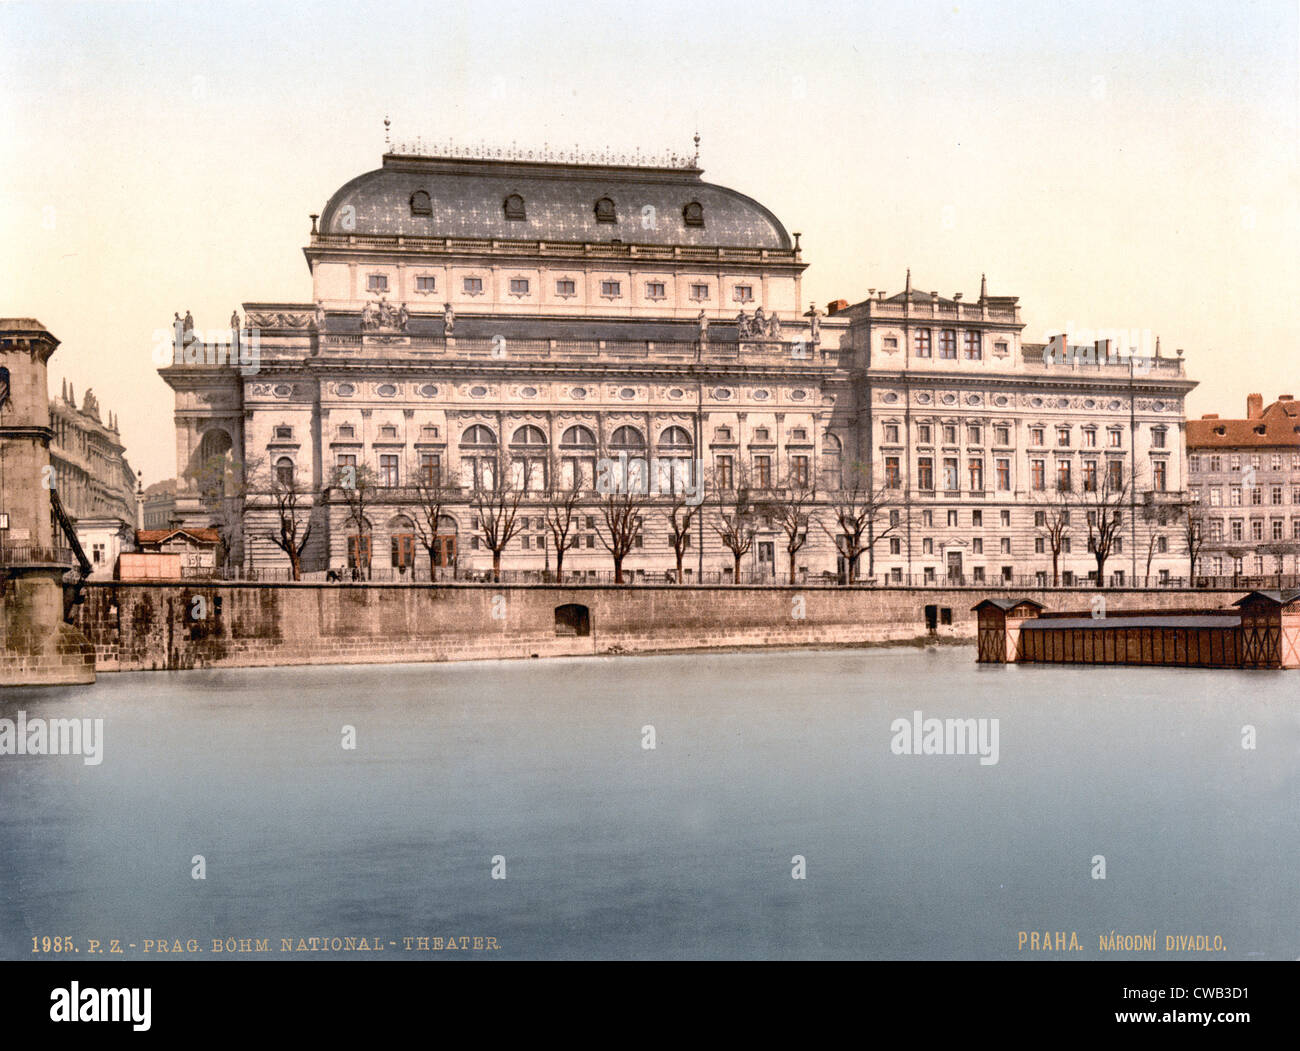 Prague, National Theatre, Bohemia, Austro-Hungary, photochrom, circa 1900. - Stock Image